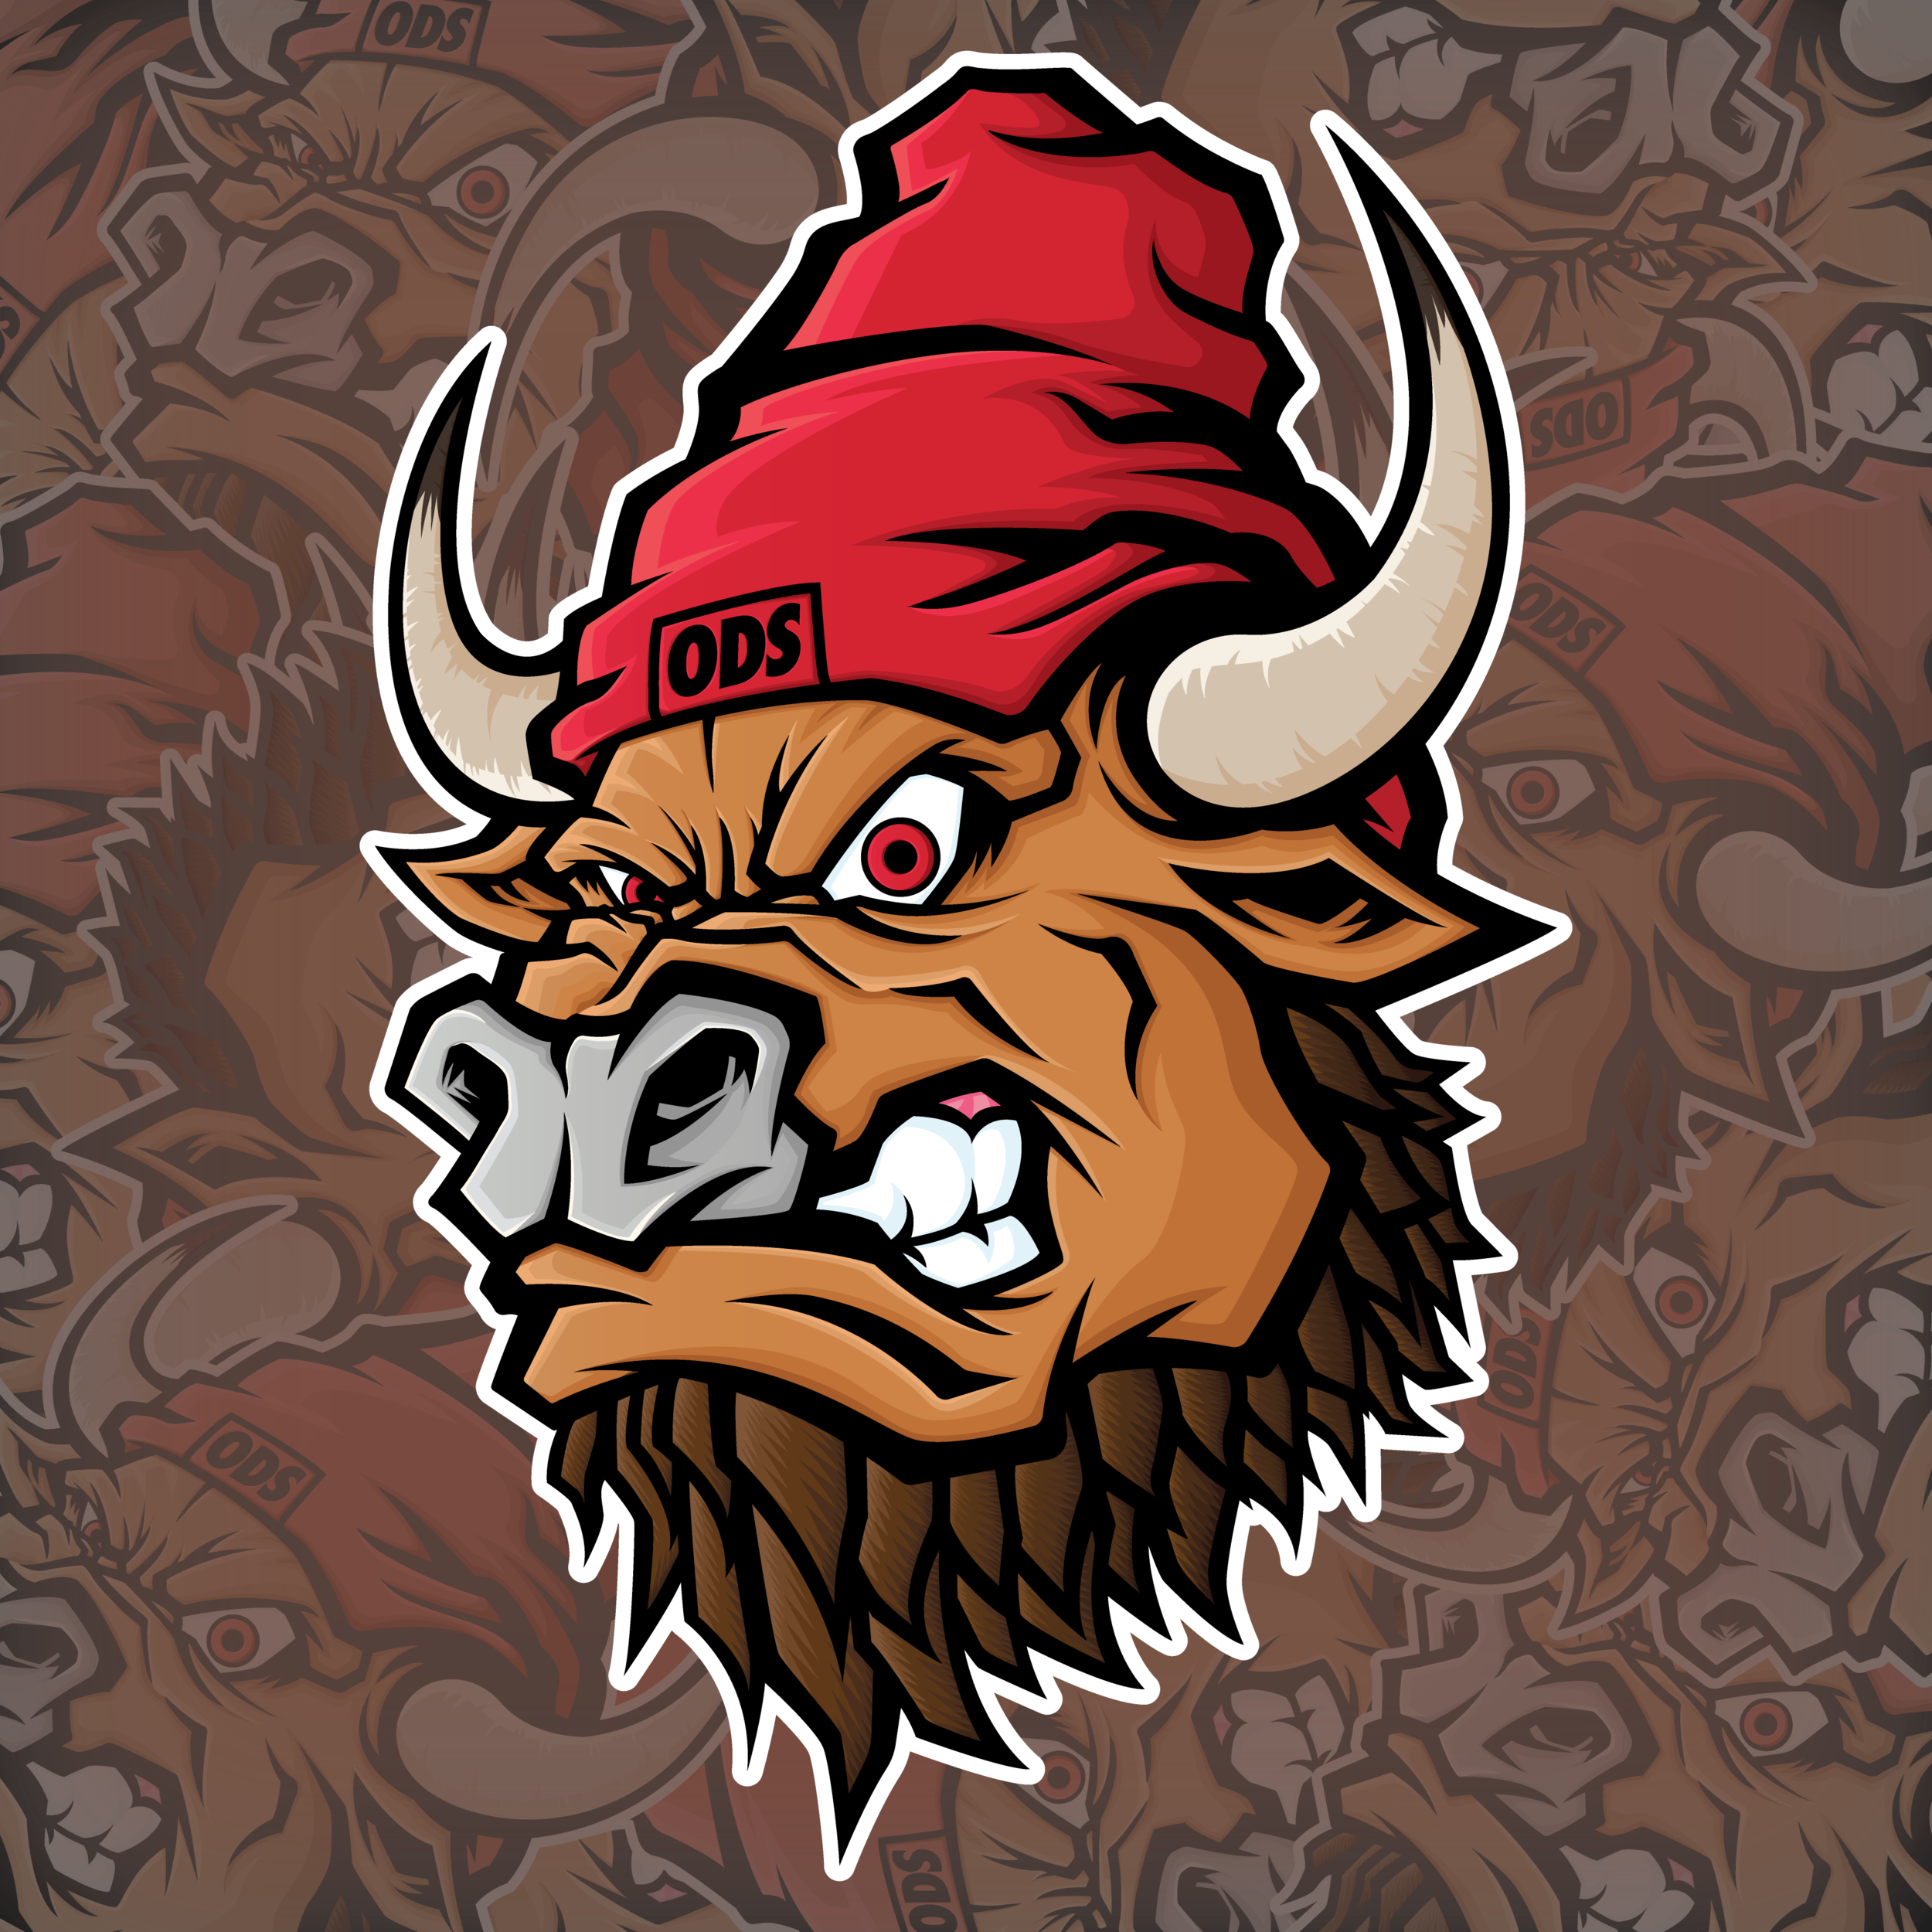 orozodesign-ox-bearded-beast-red-vector-illustration-roberto-orozco-artist-stickers.jpg